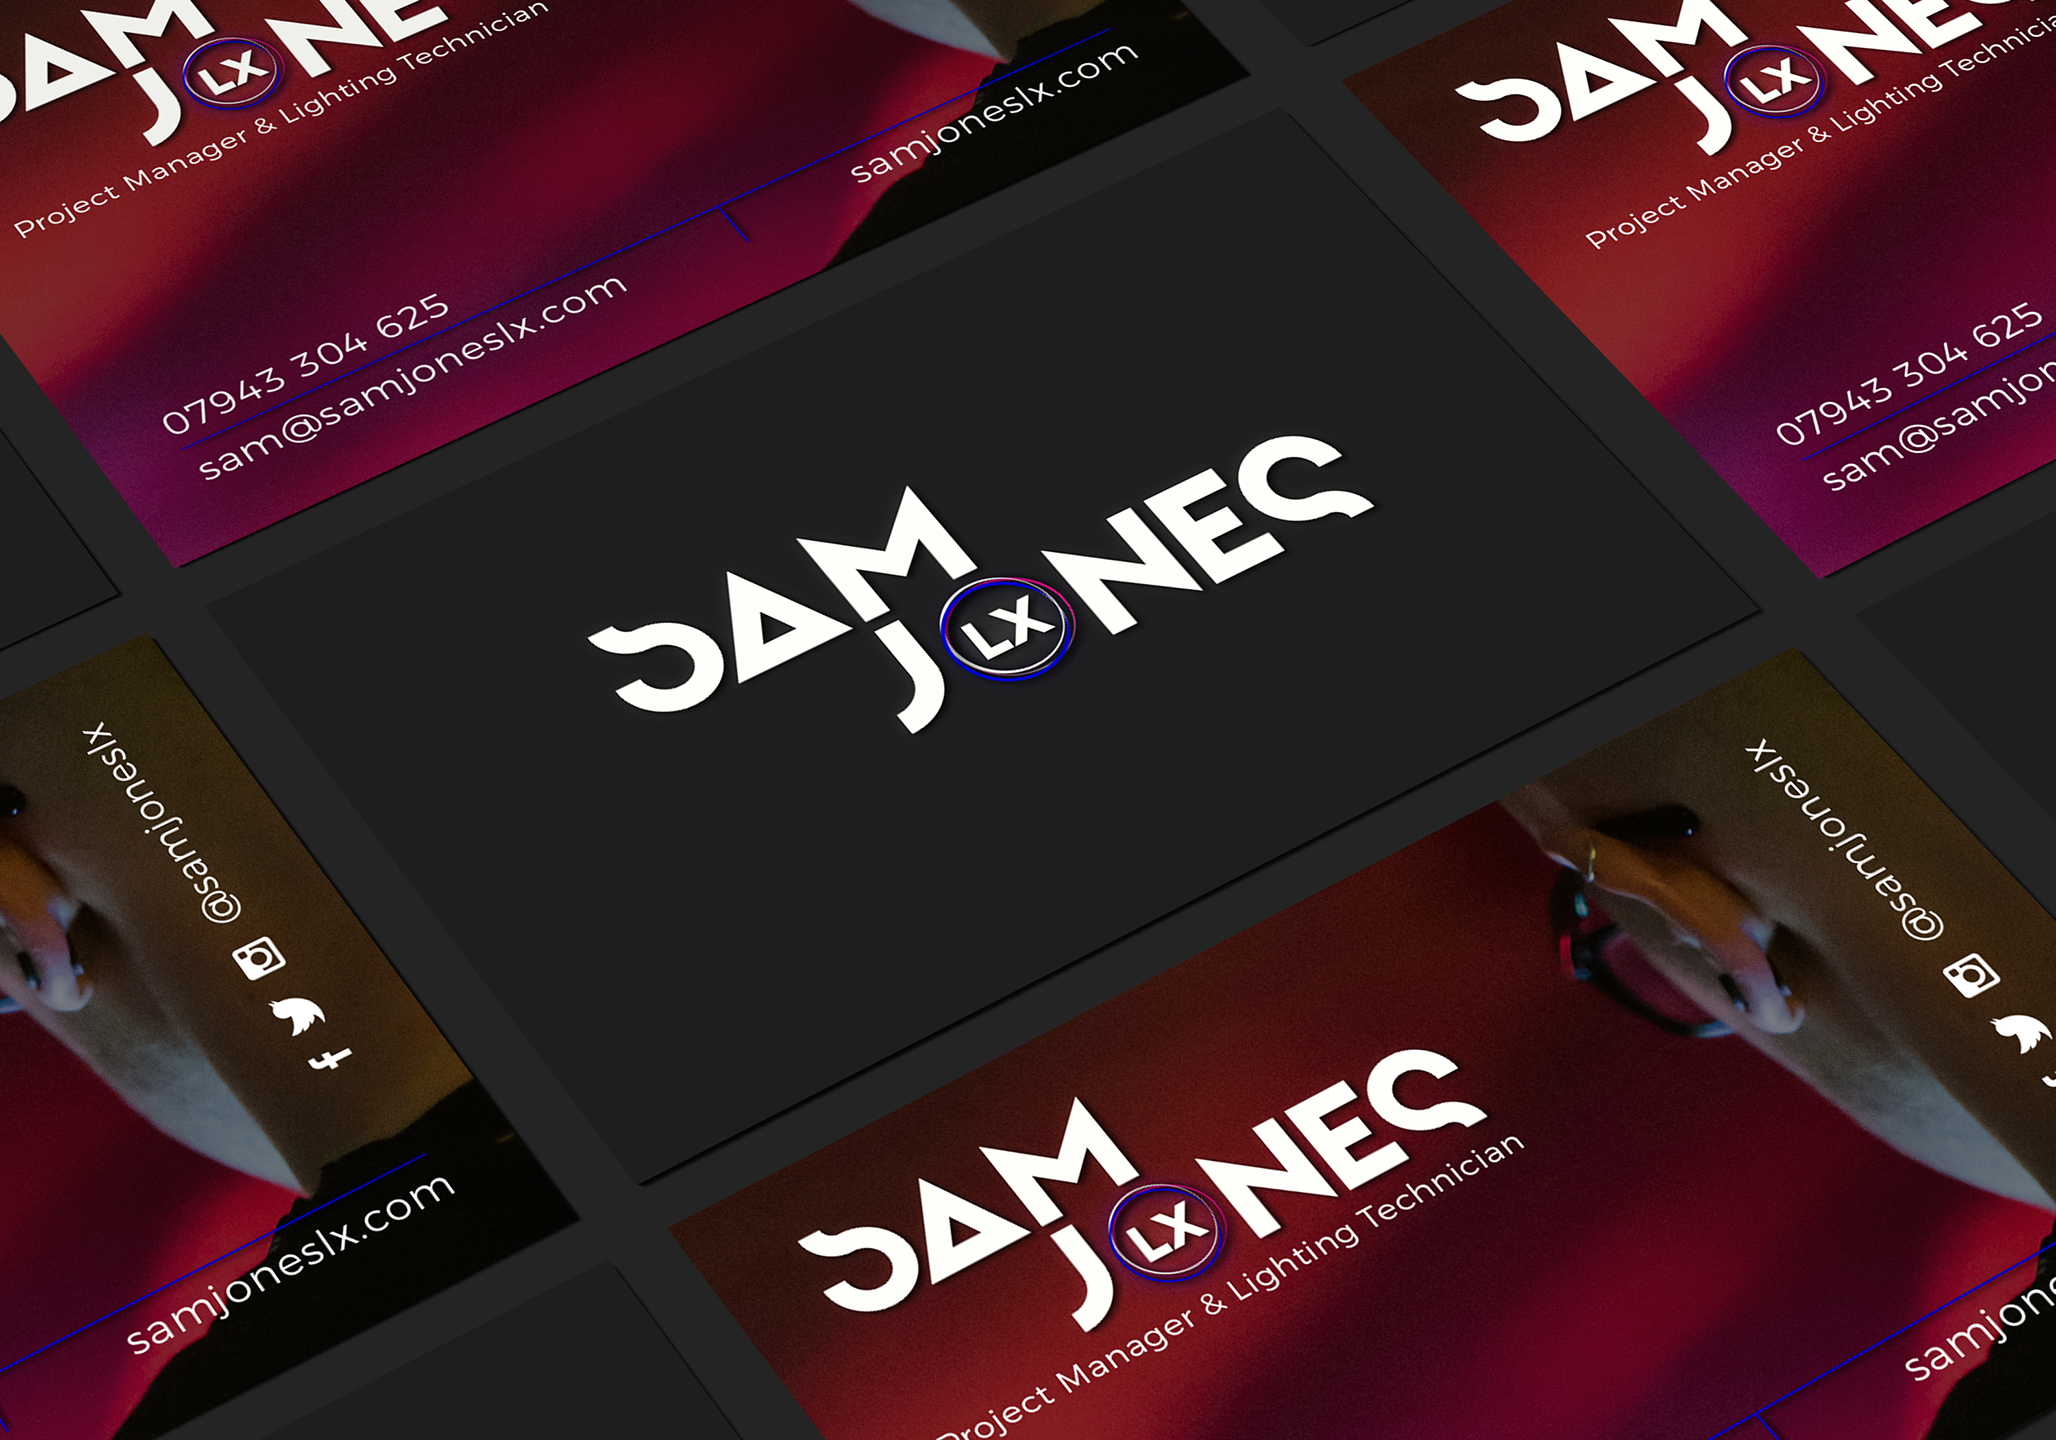 Sam Jones LX business card designed by Dephined